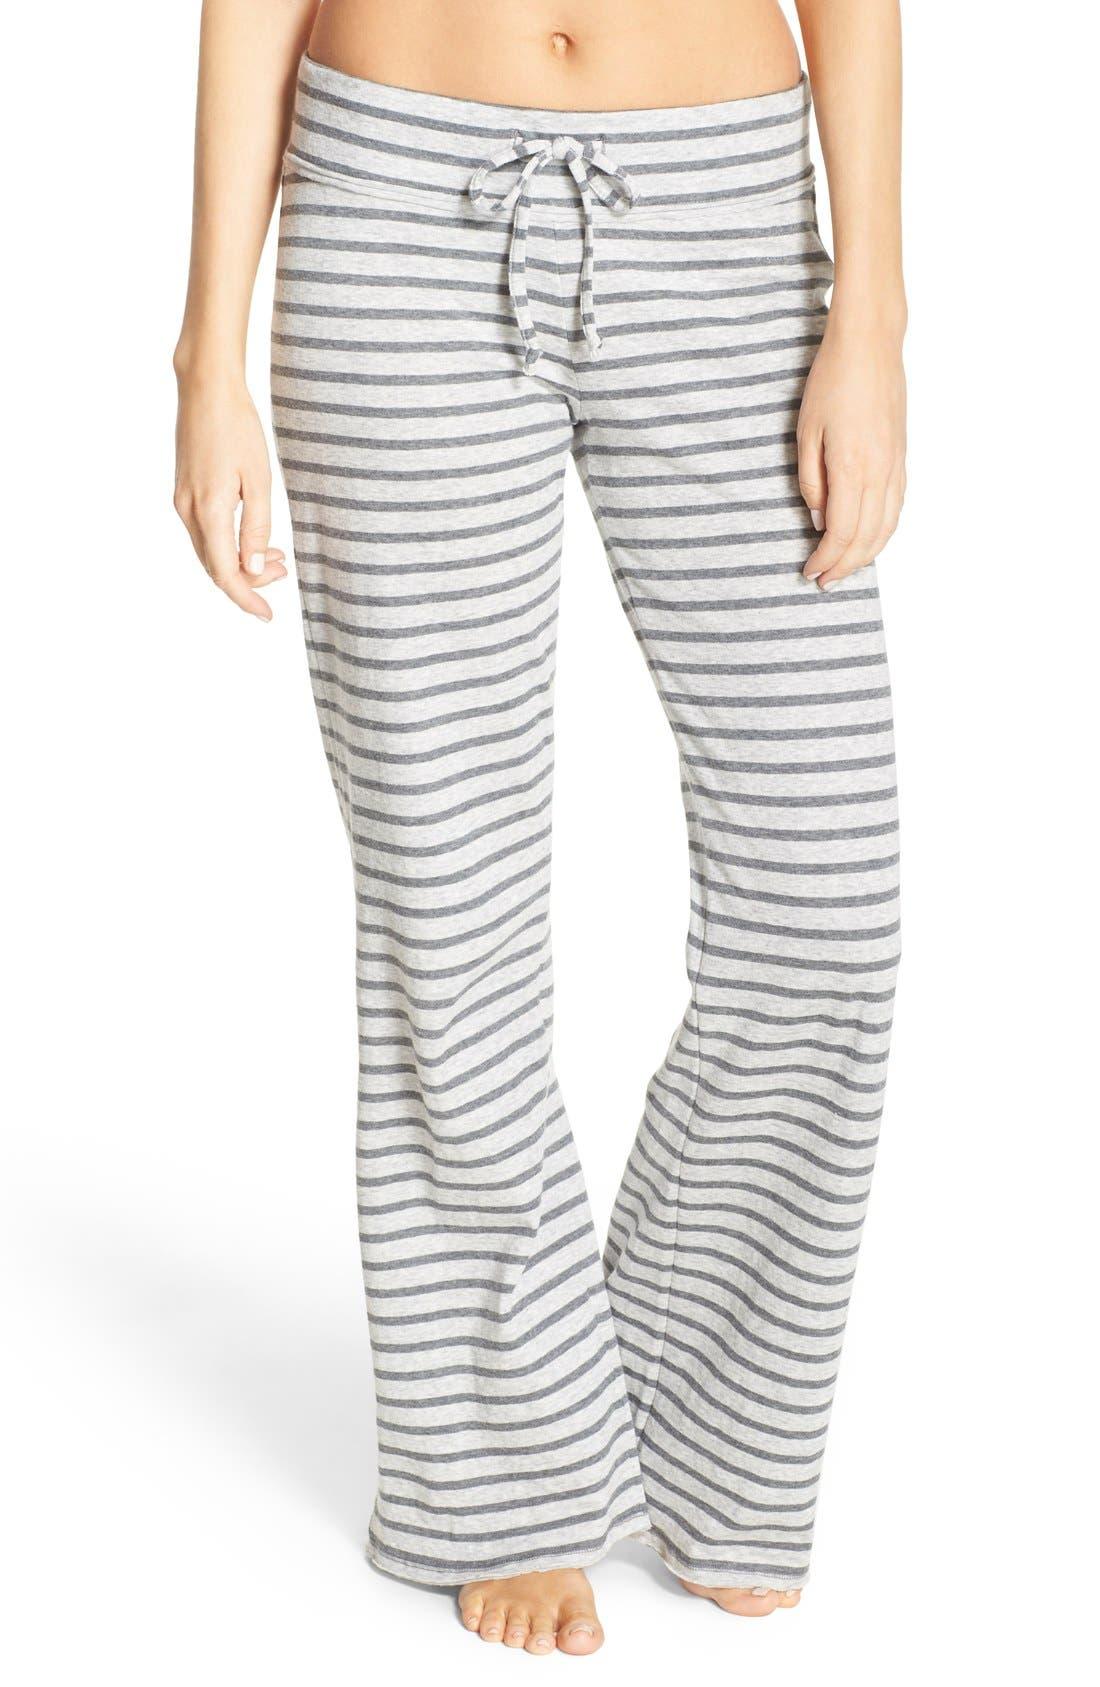 Nordstrom Lingerie 'Lazy Mornings' Lounge Pants